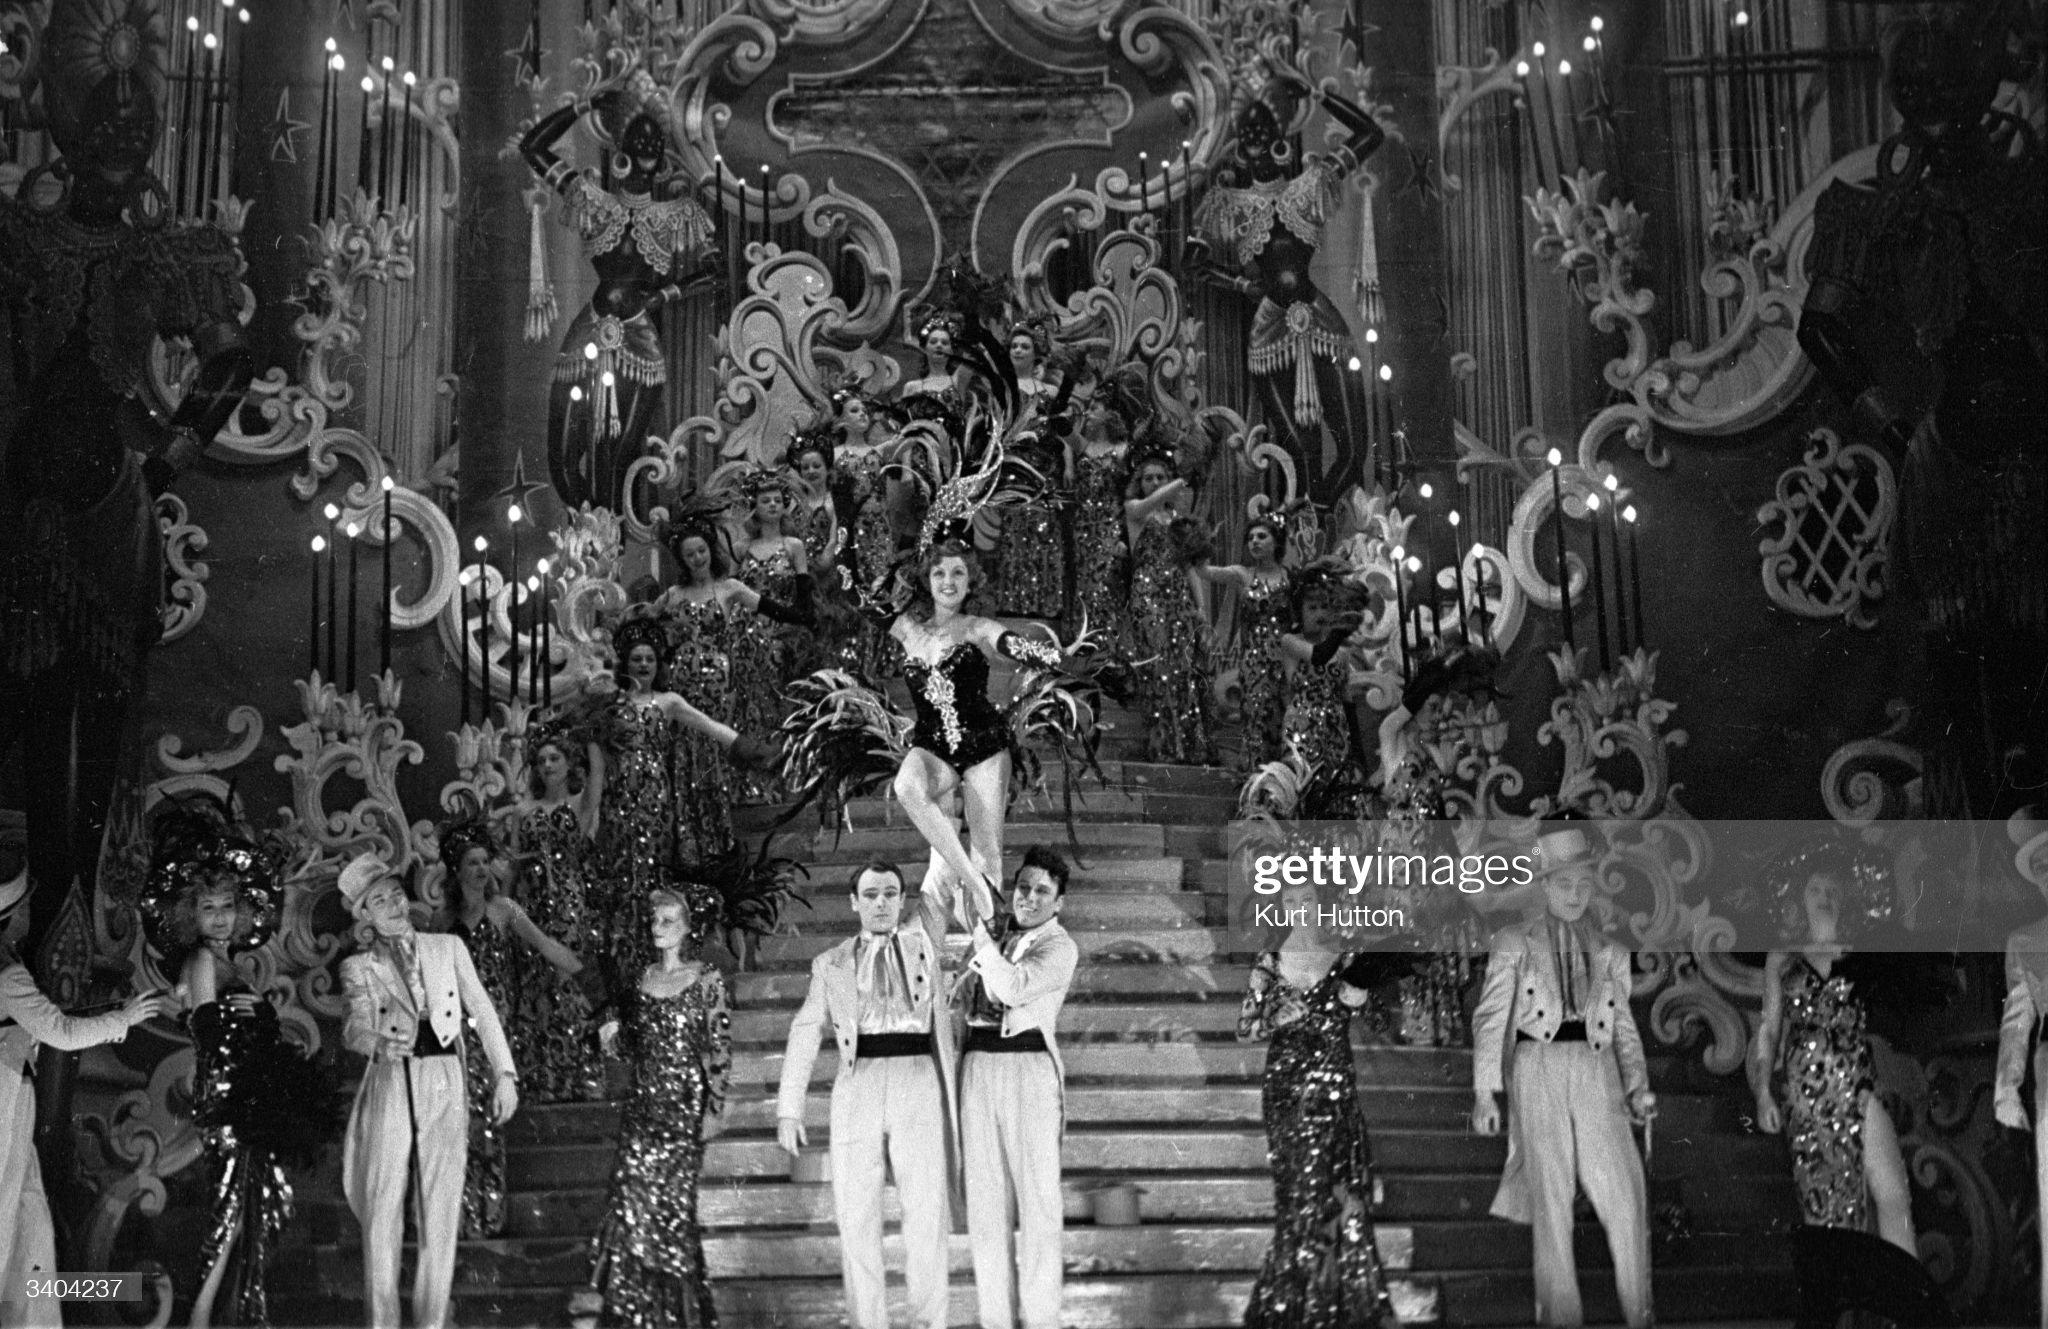 Ca s'est passé en mai ! 19th-march-1949-fortunia-a-dancer-with-the-folies-bergere-in-paris-picture-id3404237?s=2048x2048